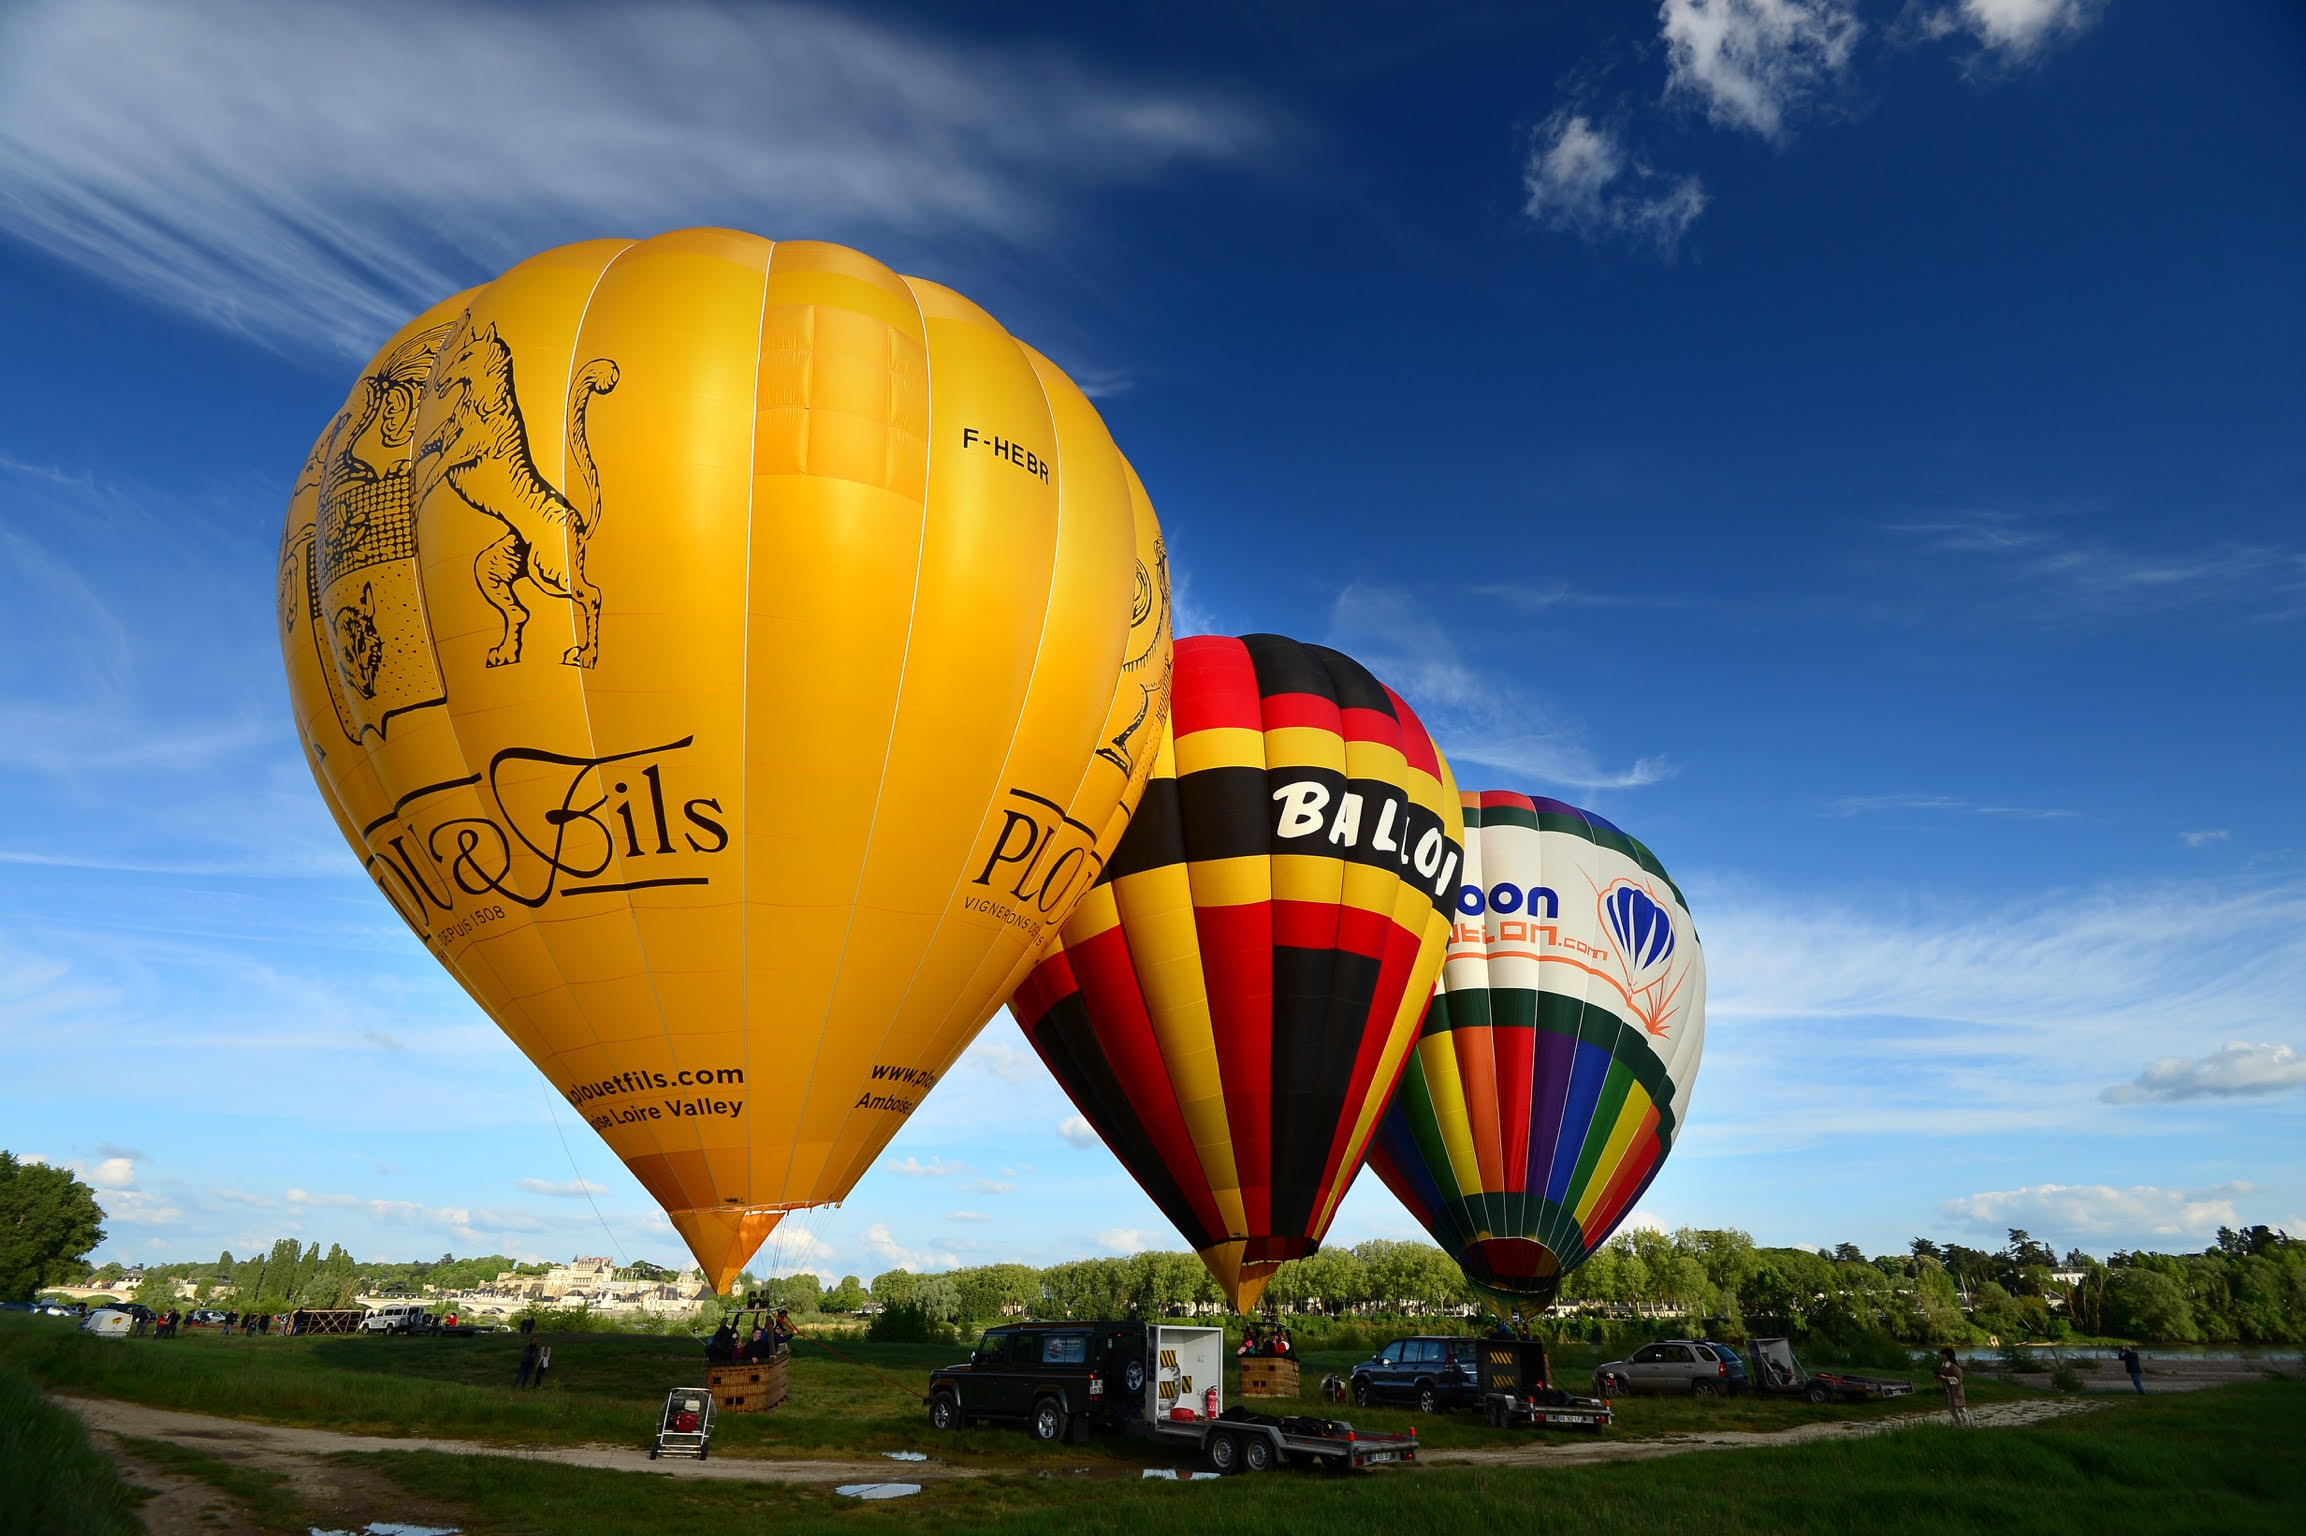 Ballon Revolution - Balloon Revolution